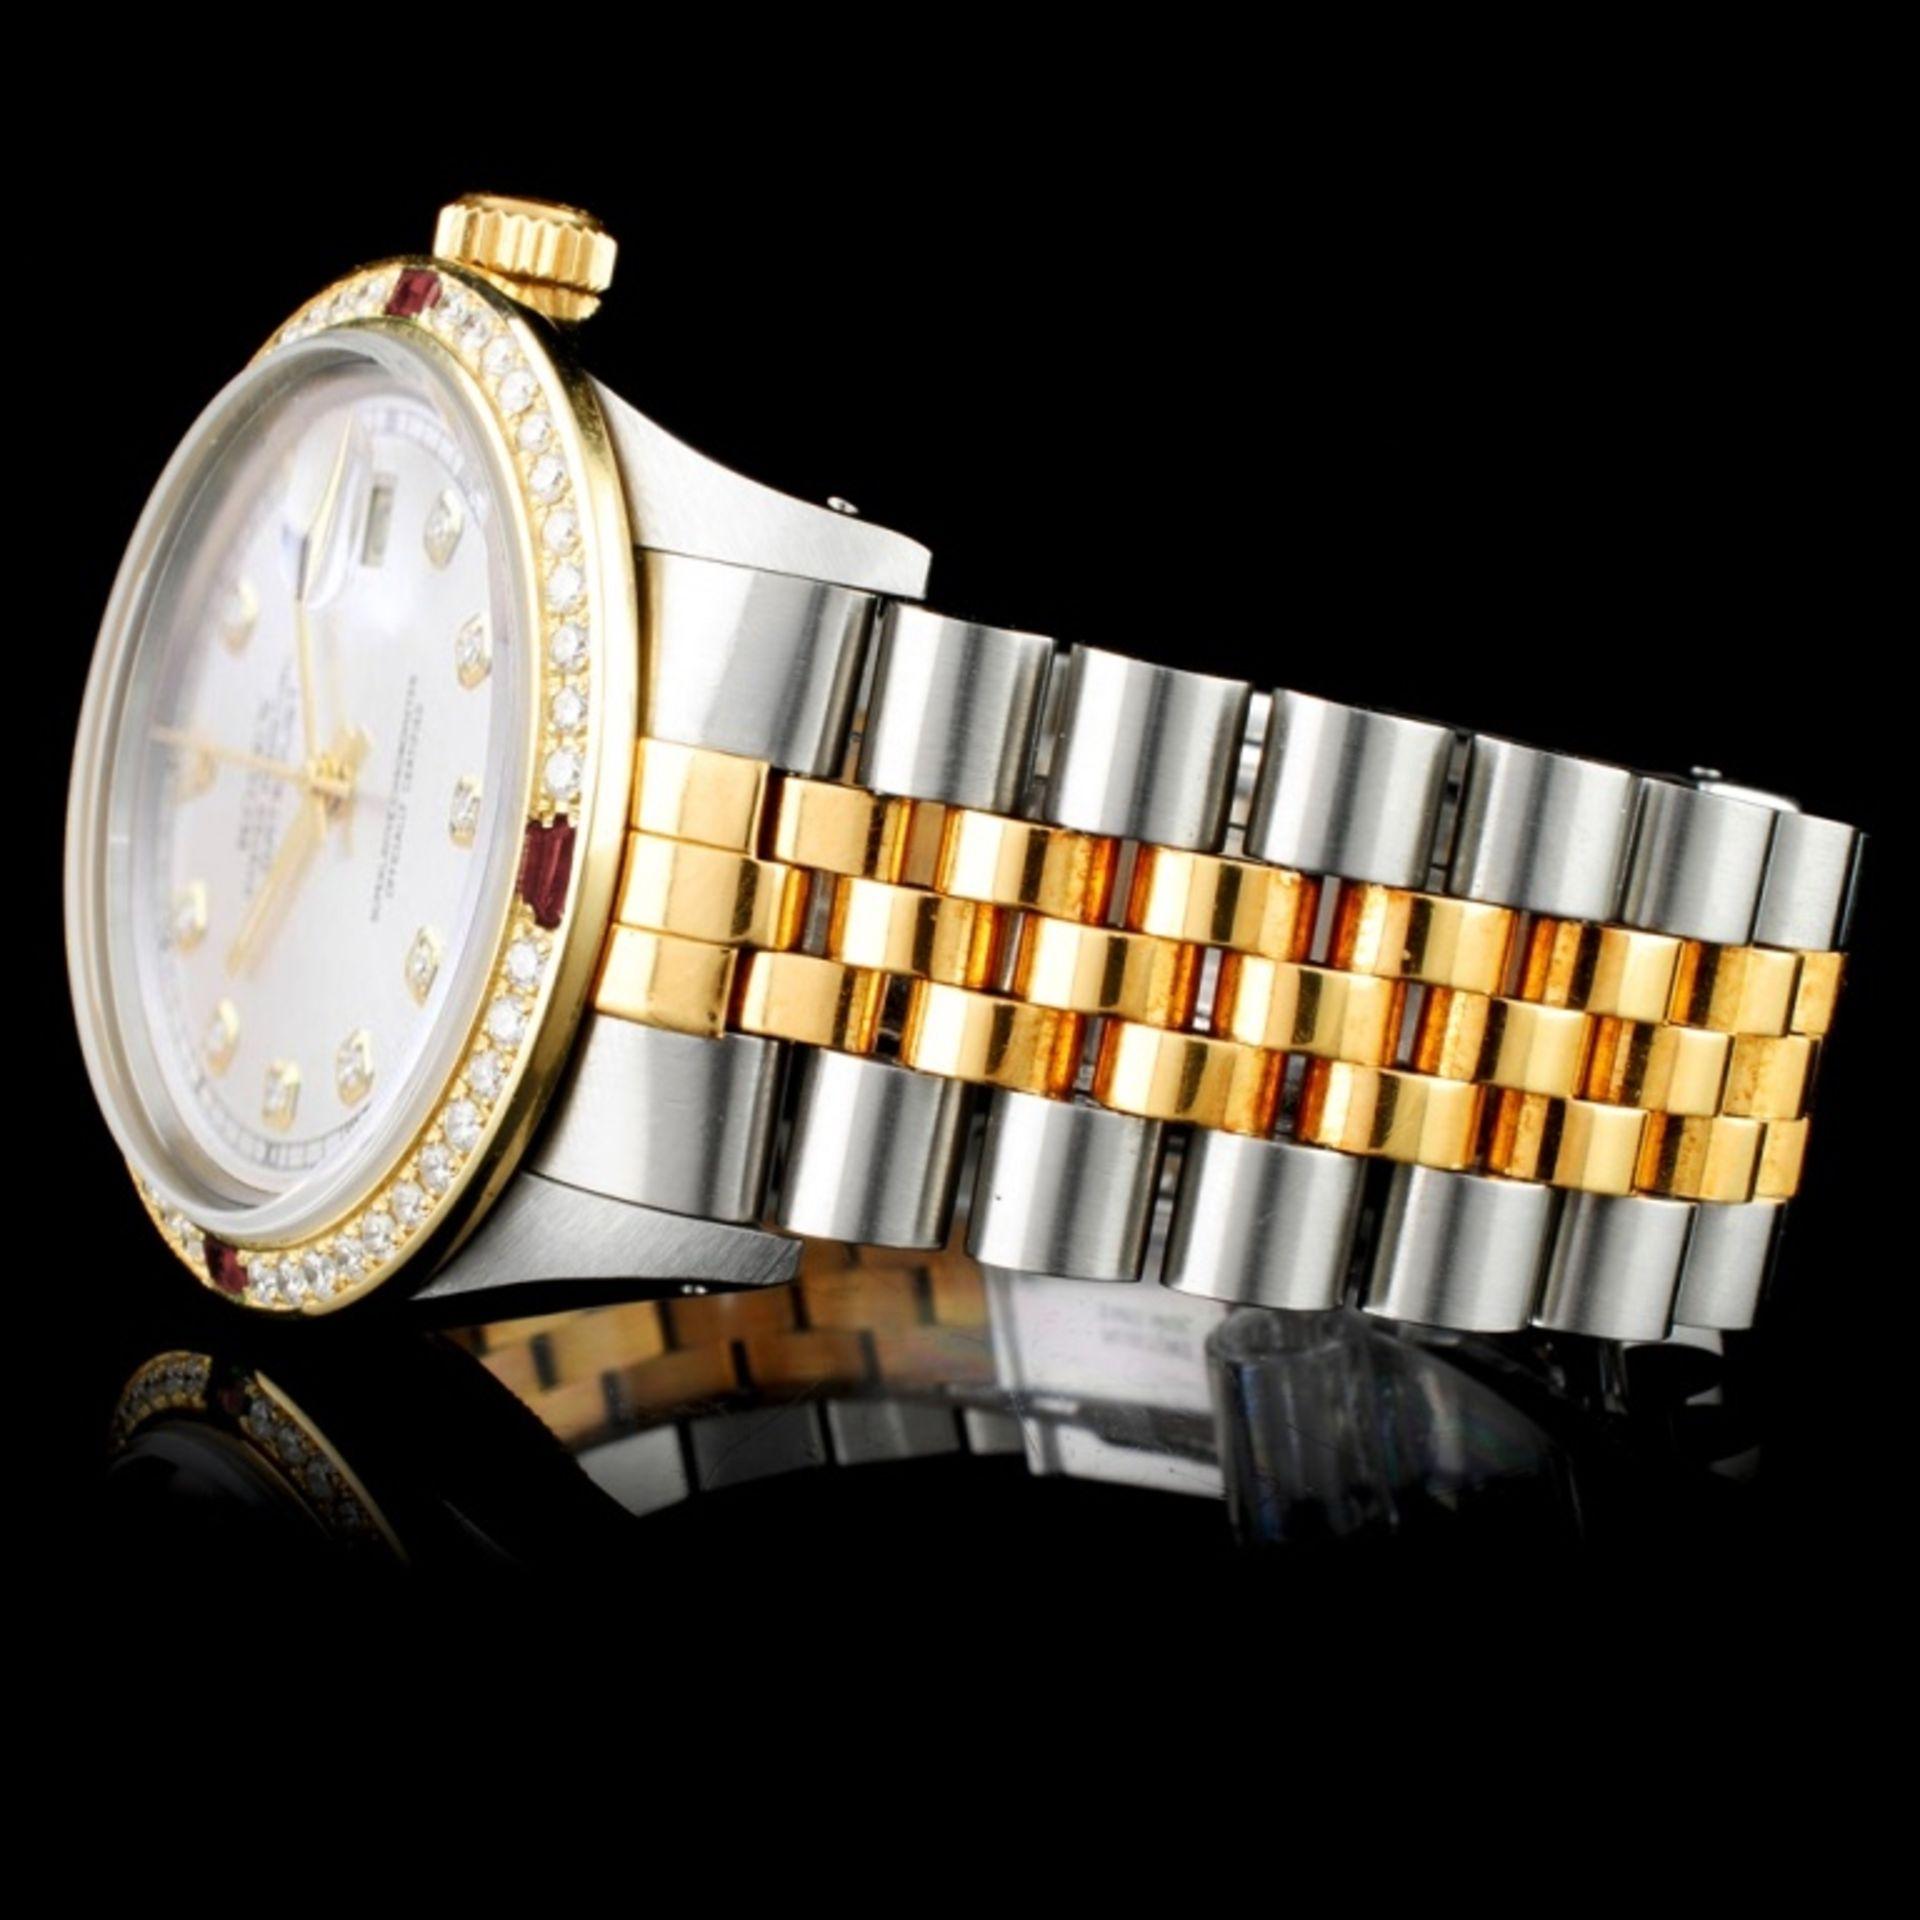 Rolex DateJust 18K/SS Diamond 36mm Watch - Image 3 of 6